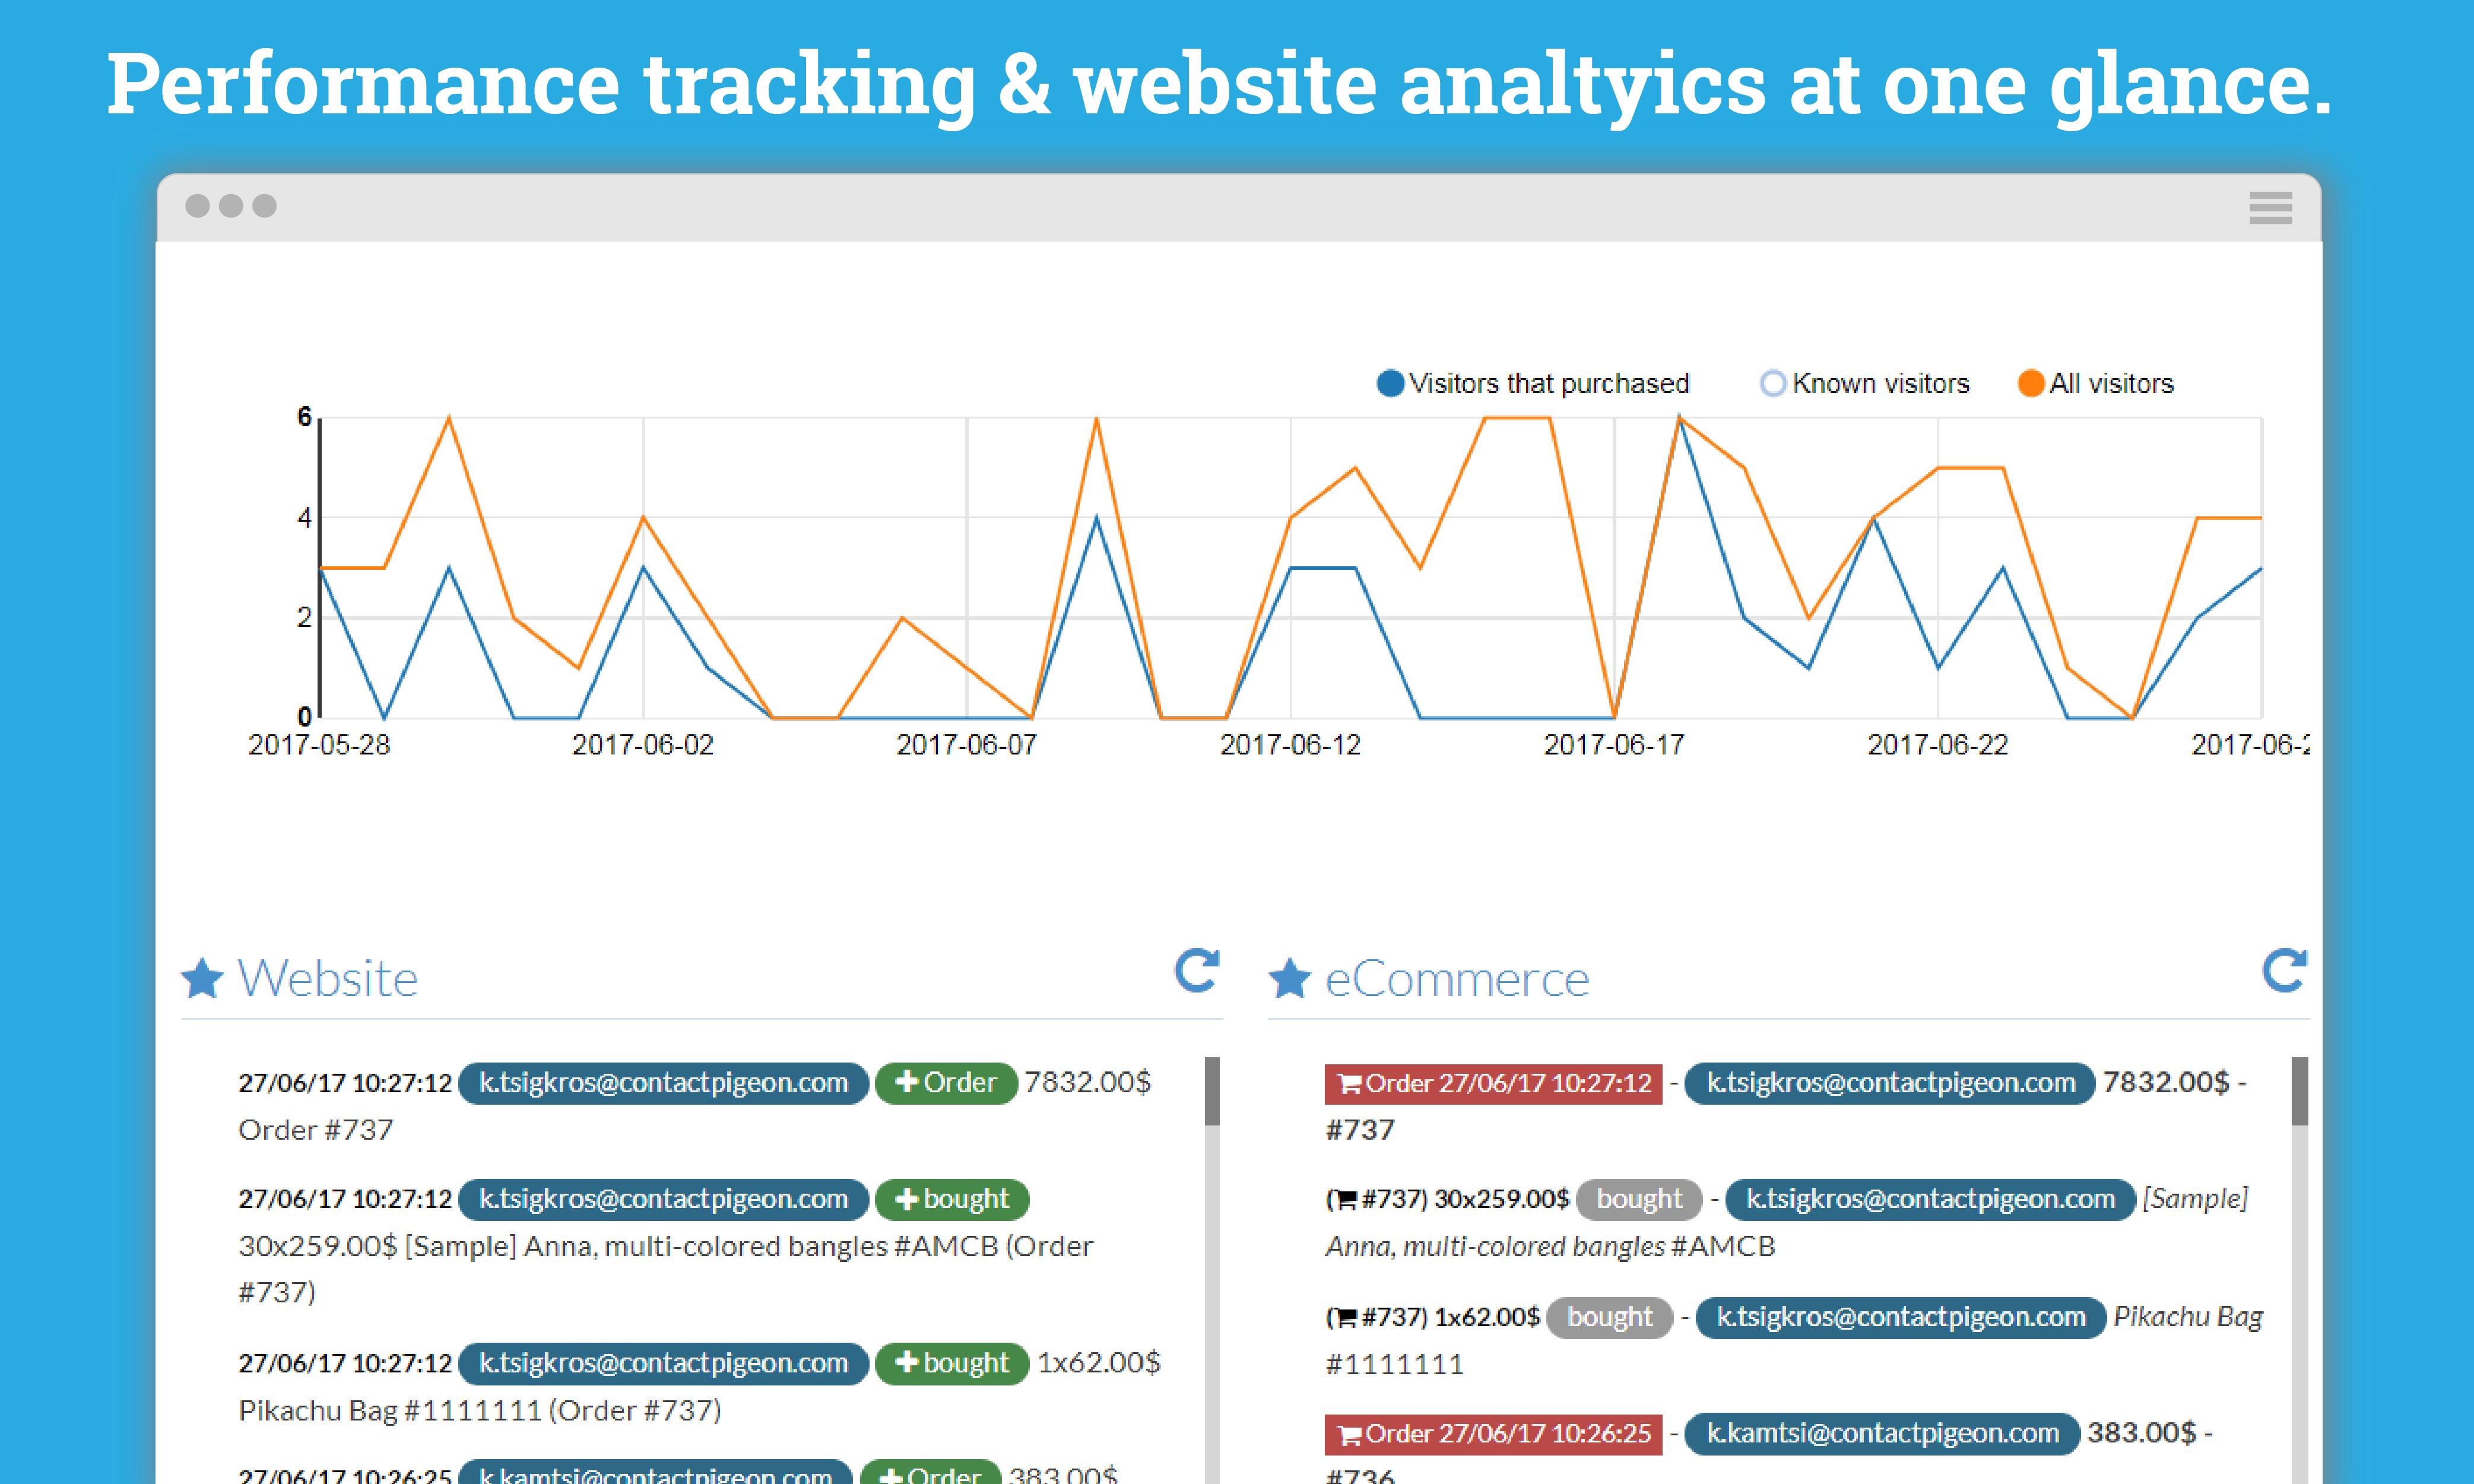 Website behavior & eCommerce tracking